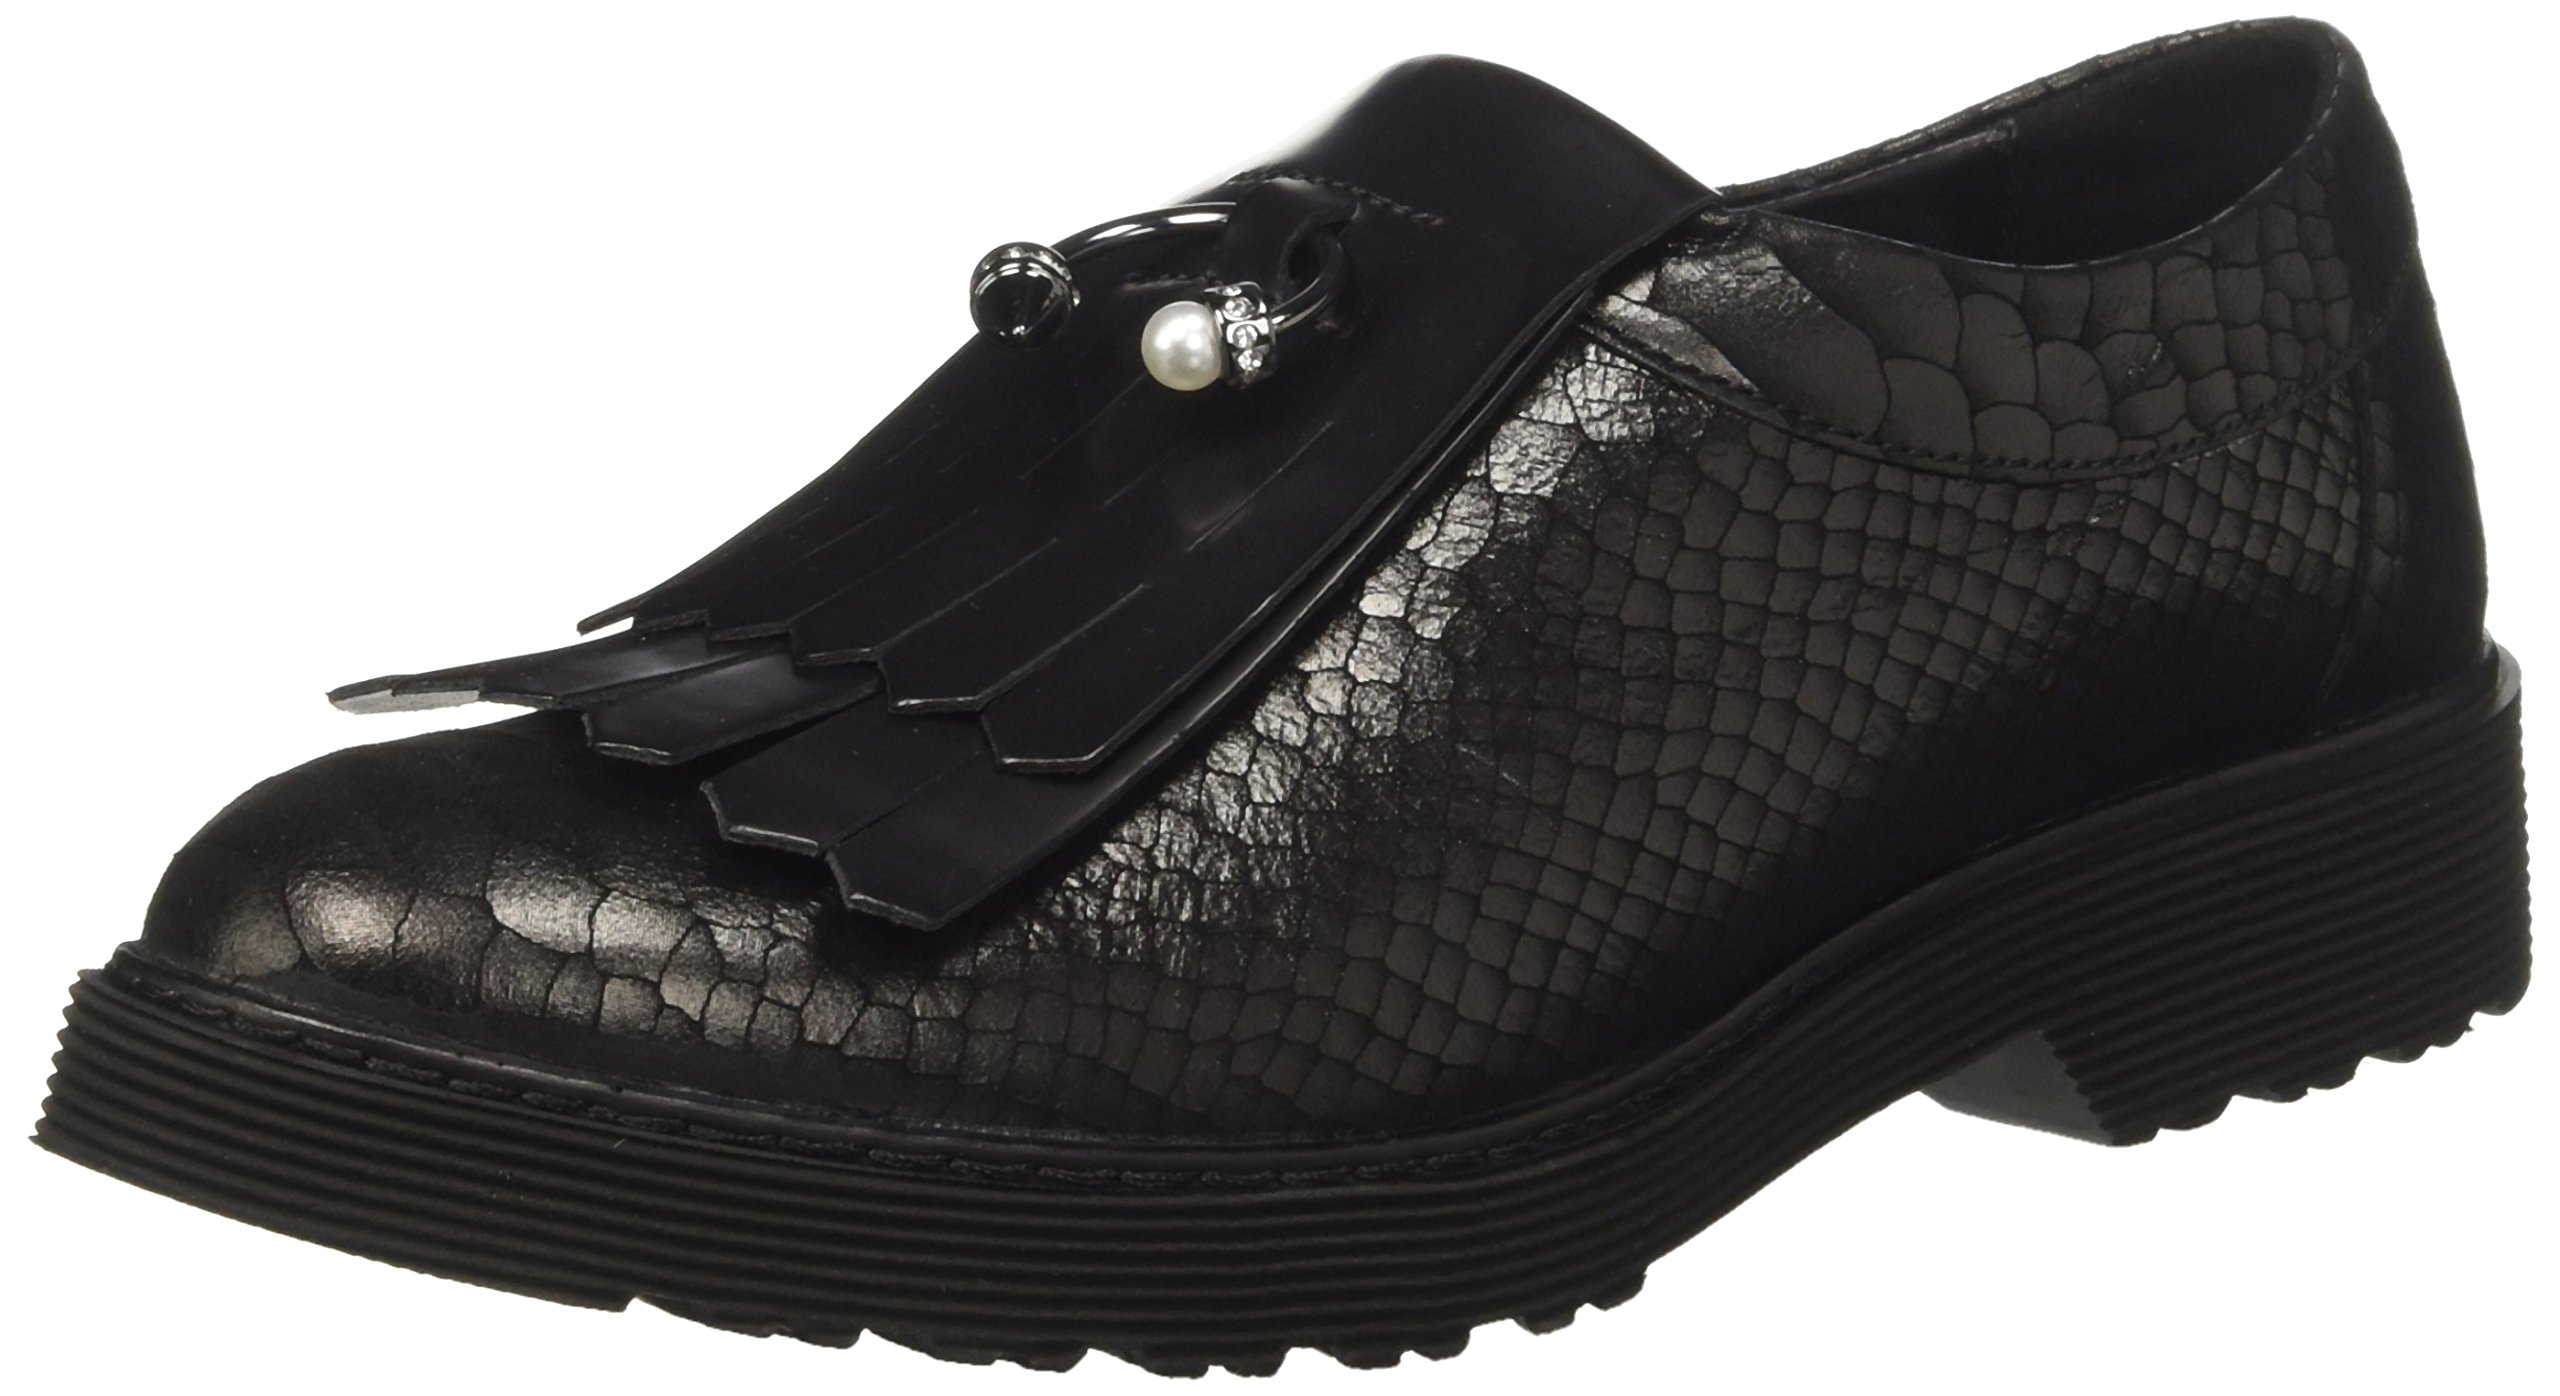 CultSneakers black FemmeNoirblack Basses 98040 Eu dBhQrCsoxt